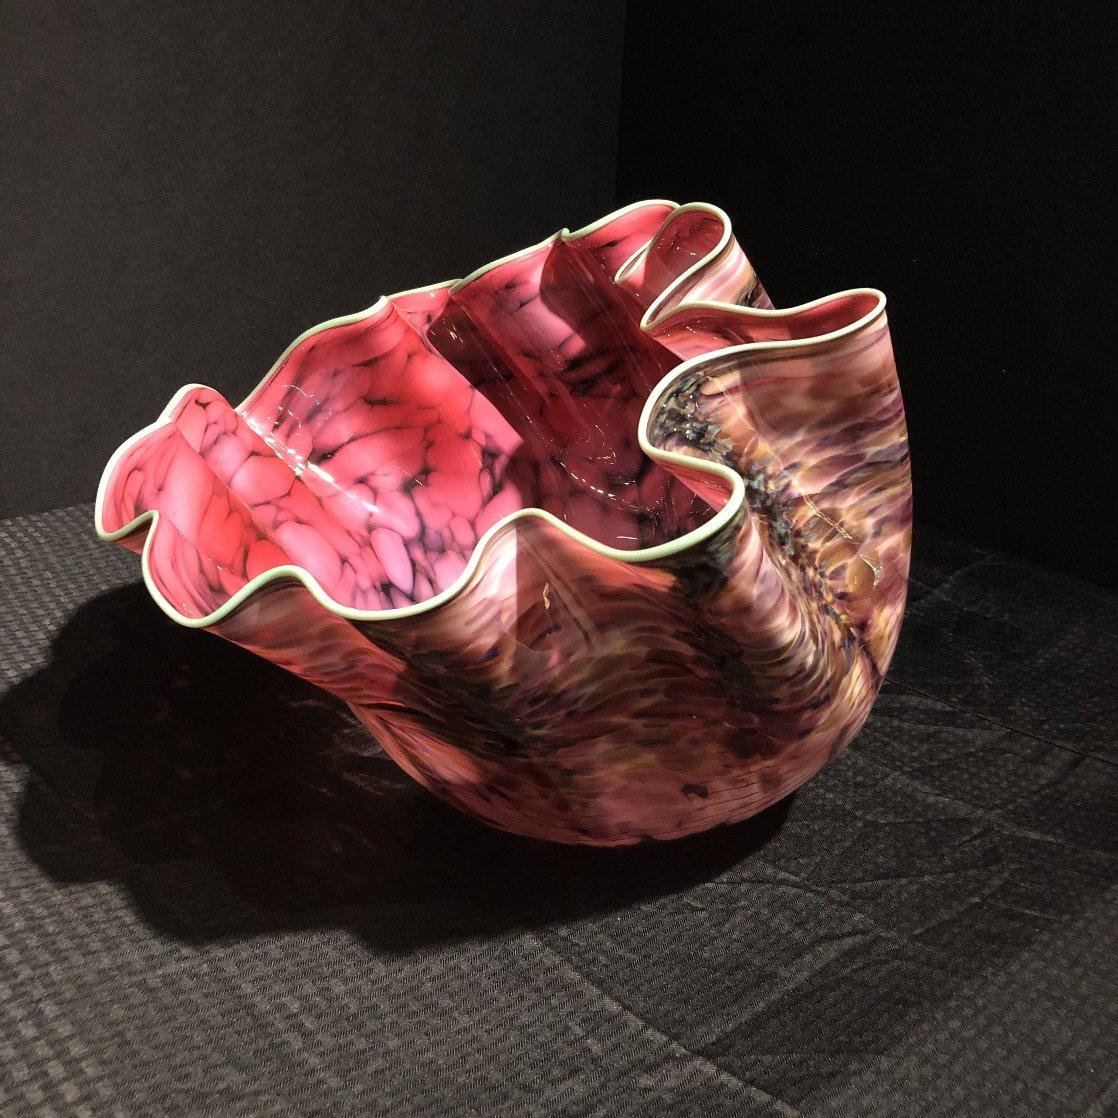 Alizarin Crimson Macchia With Viridian Lip Wrap Glass Sculpture 1983 28 in  Sculpture by Dale Chihuly